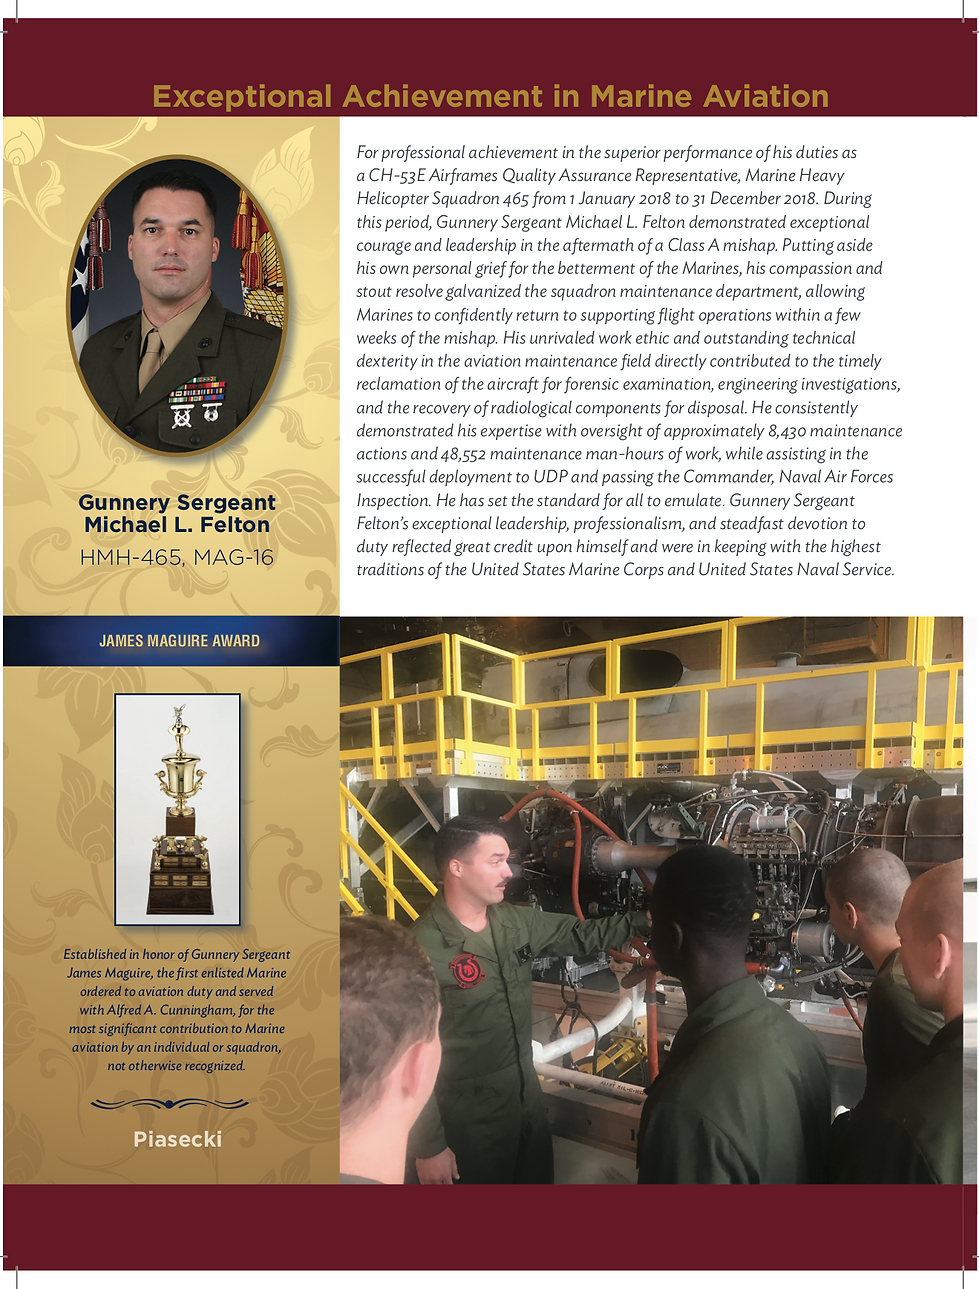 2019 James Maguire Award